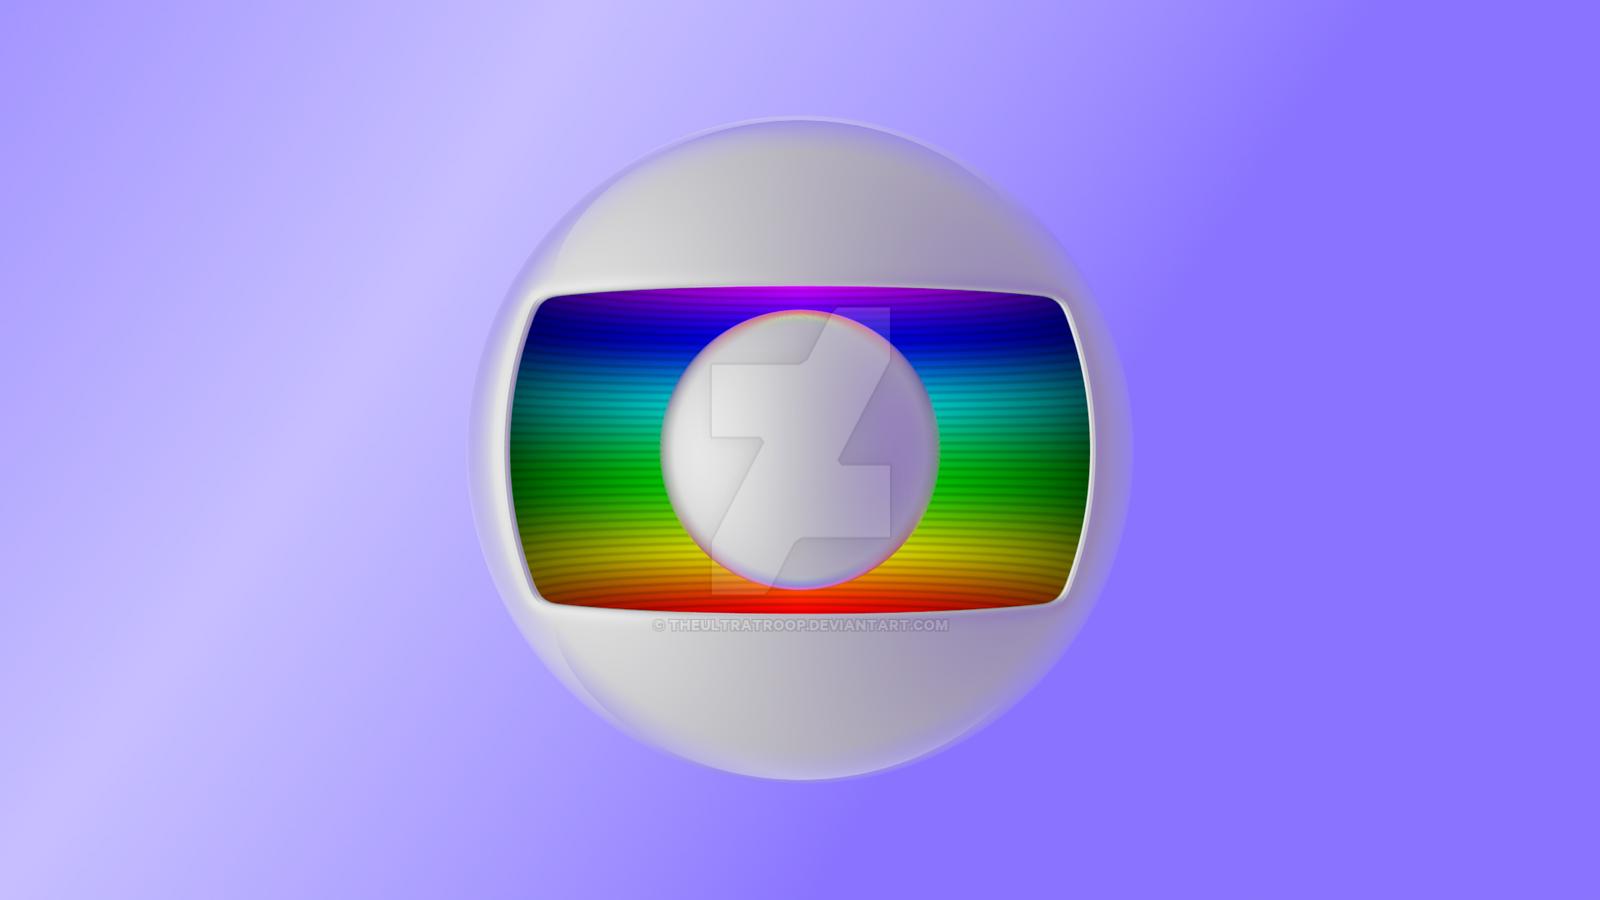 Rede globo logo by theultratroop on deviantart - Oglo o ...